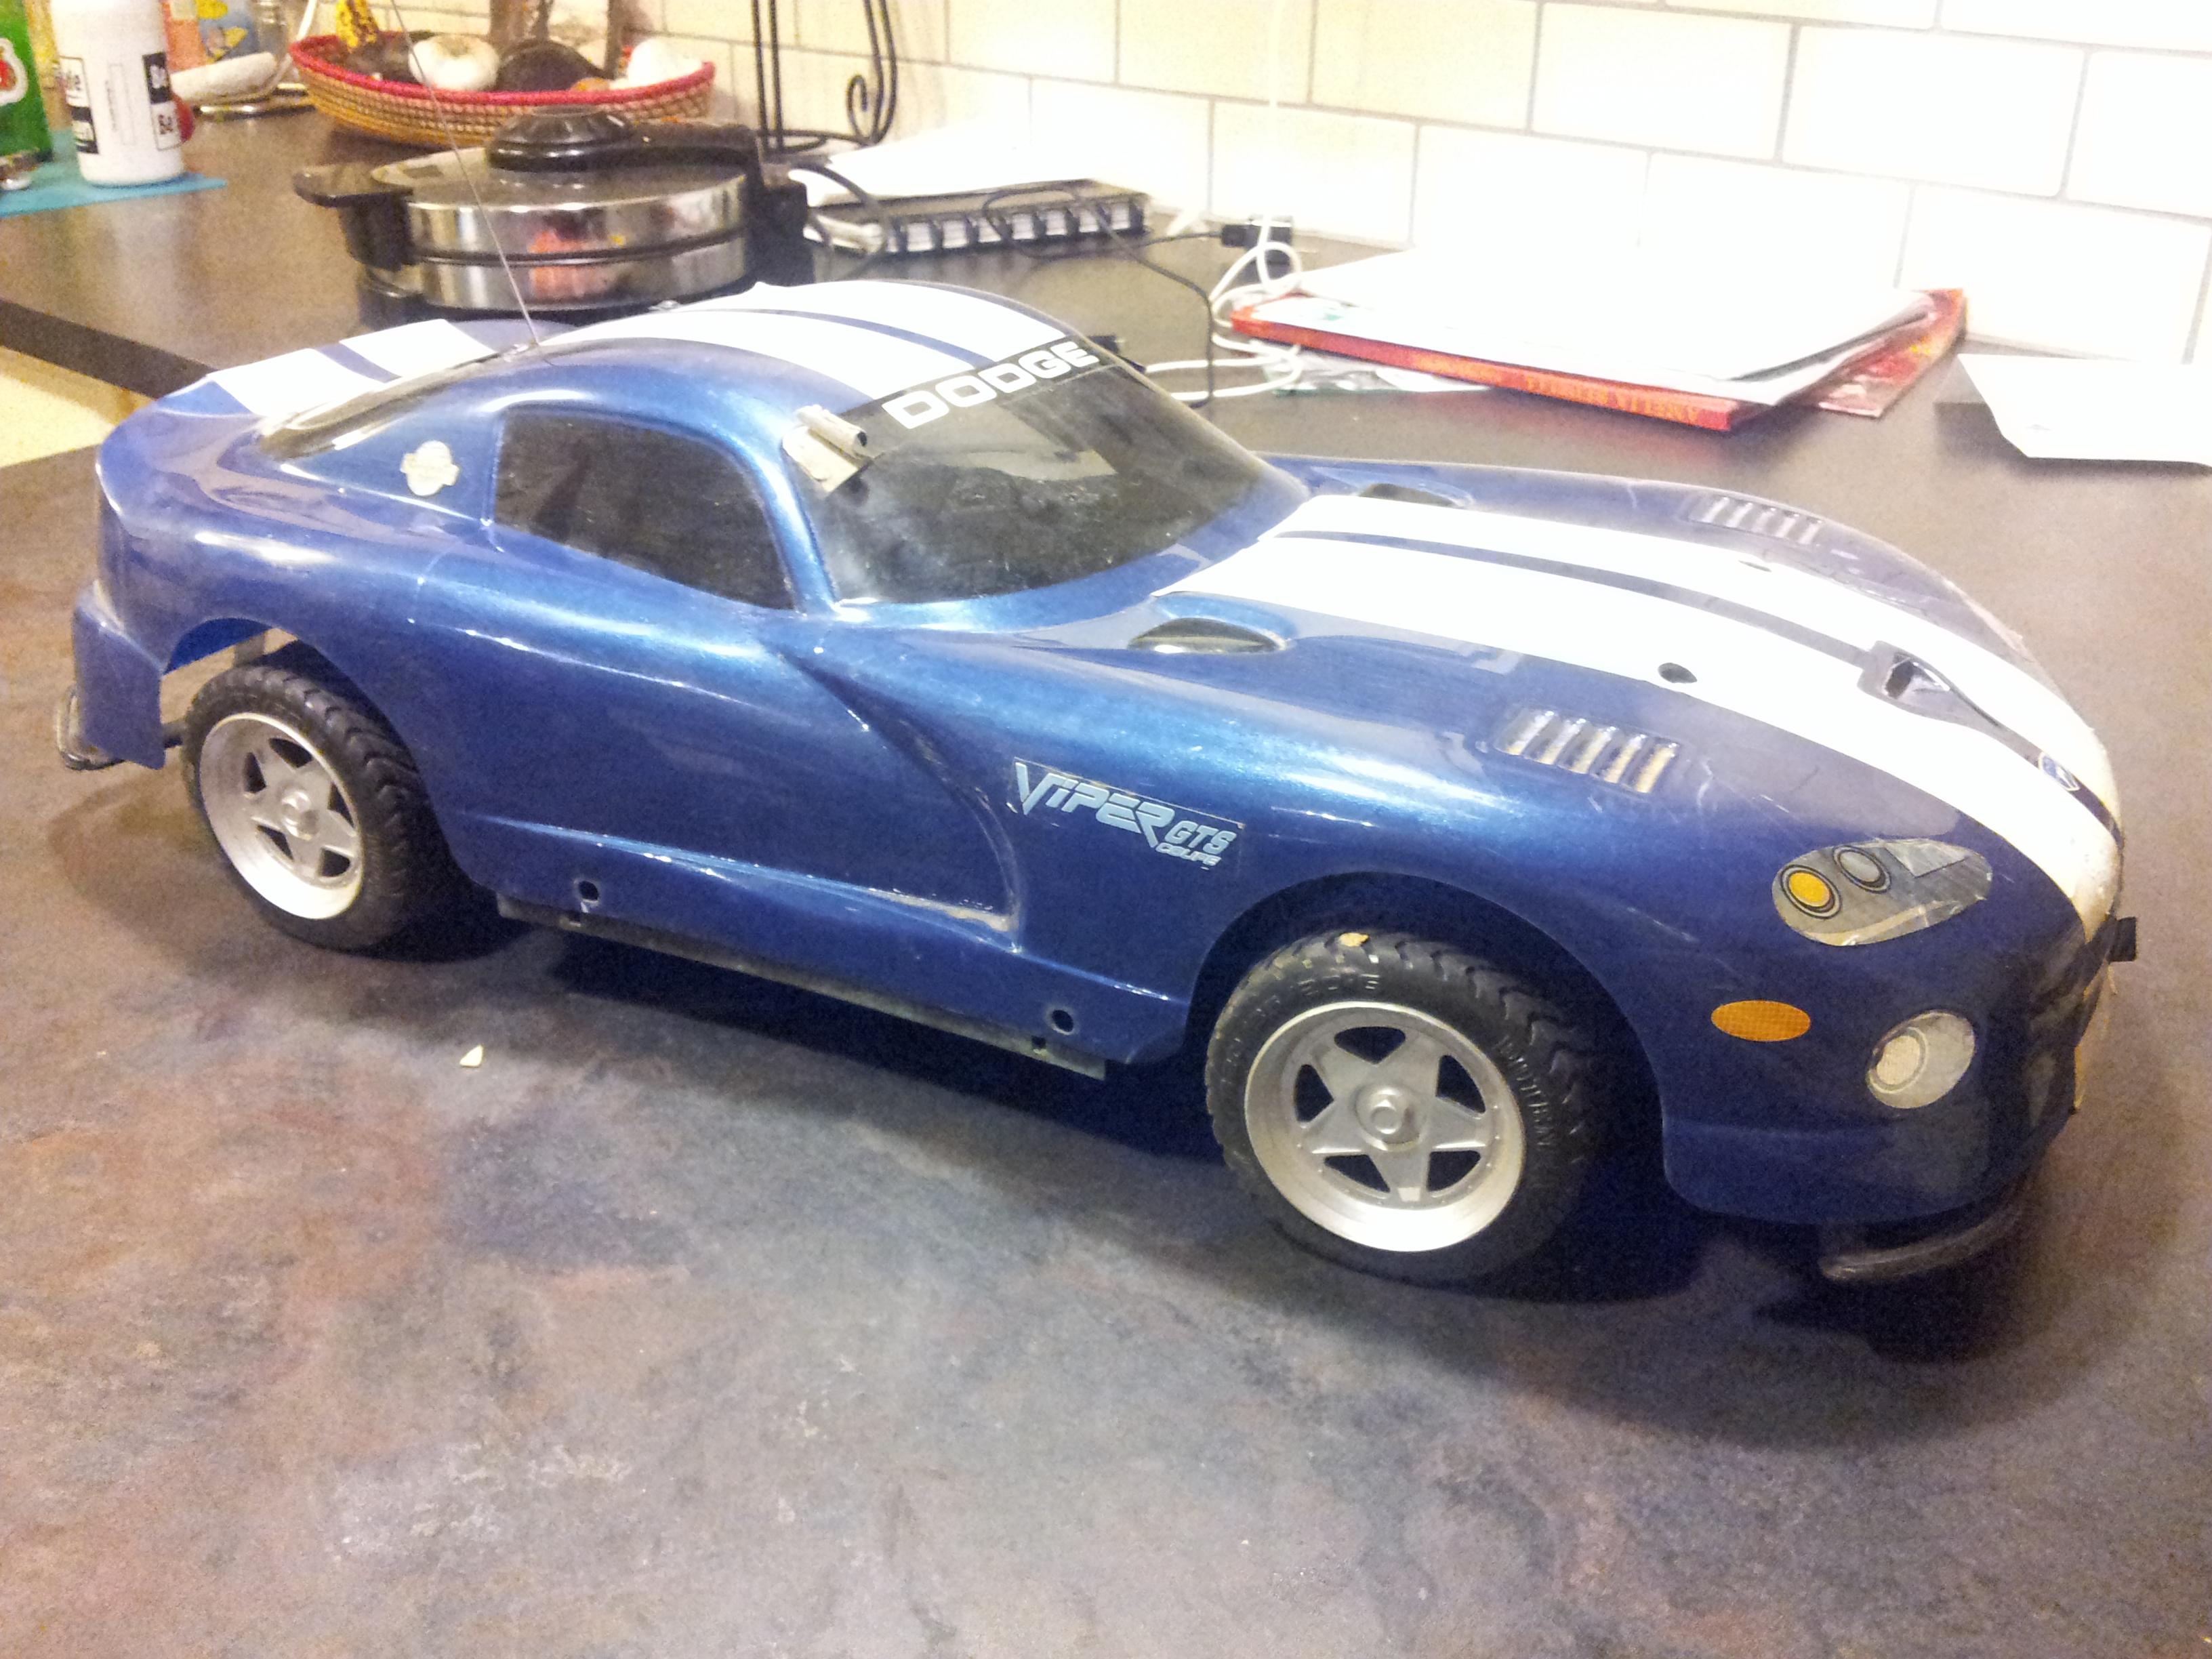 Help identifying Viper GTS RC car - RCU Forums